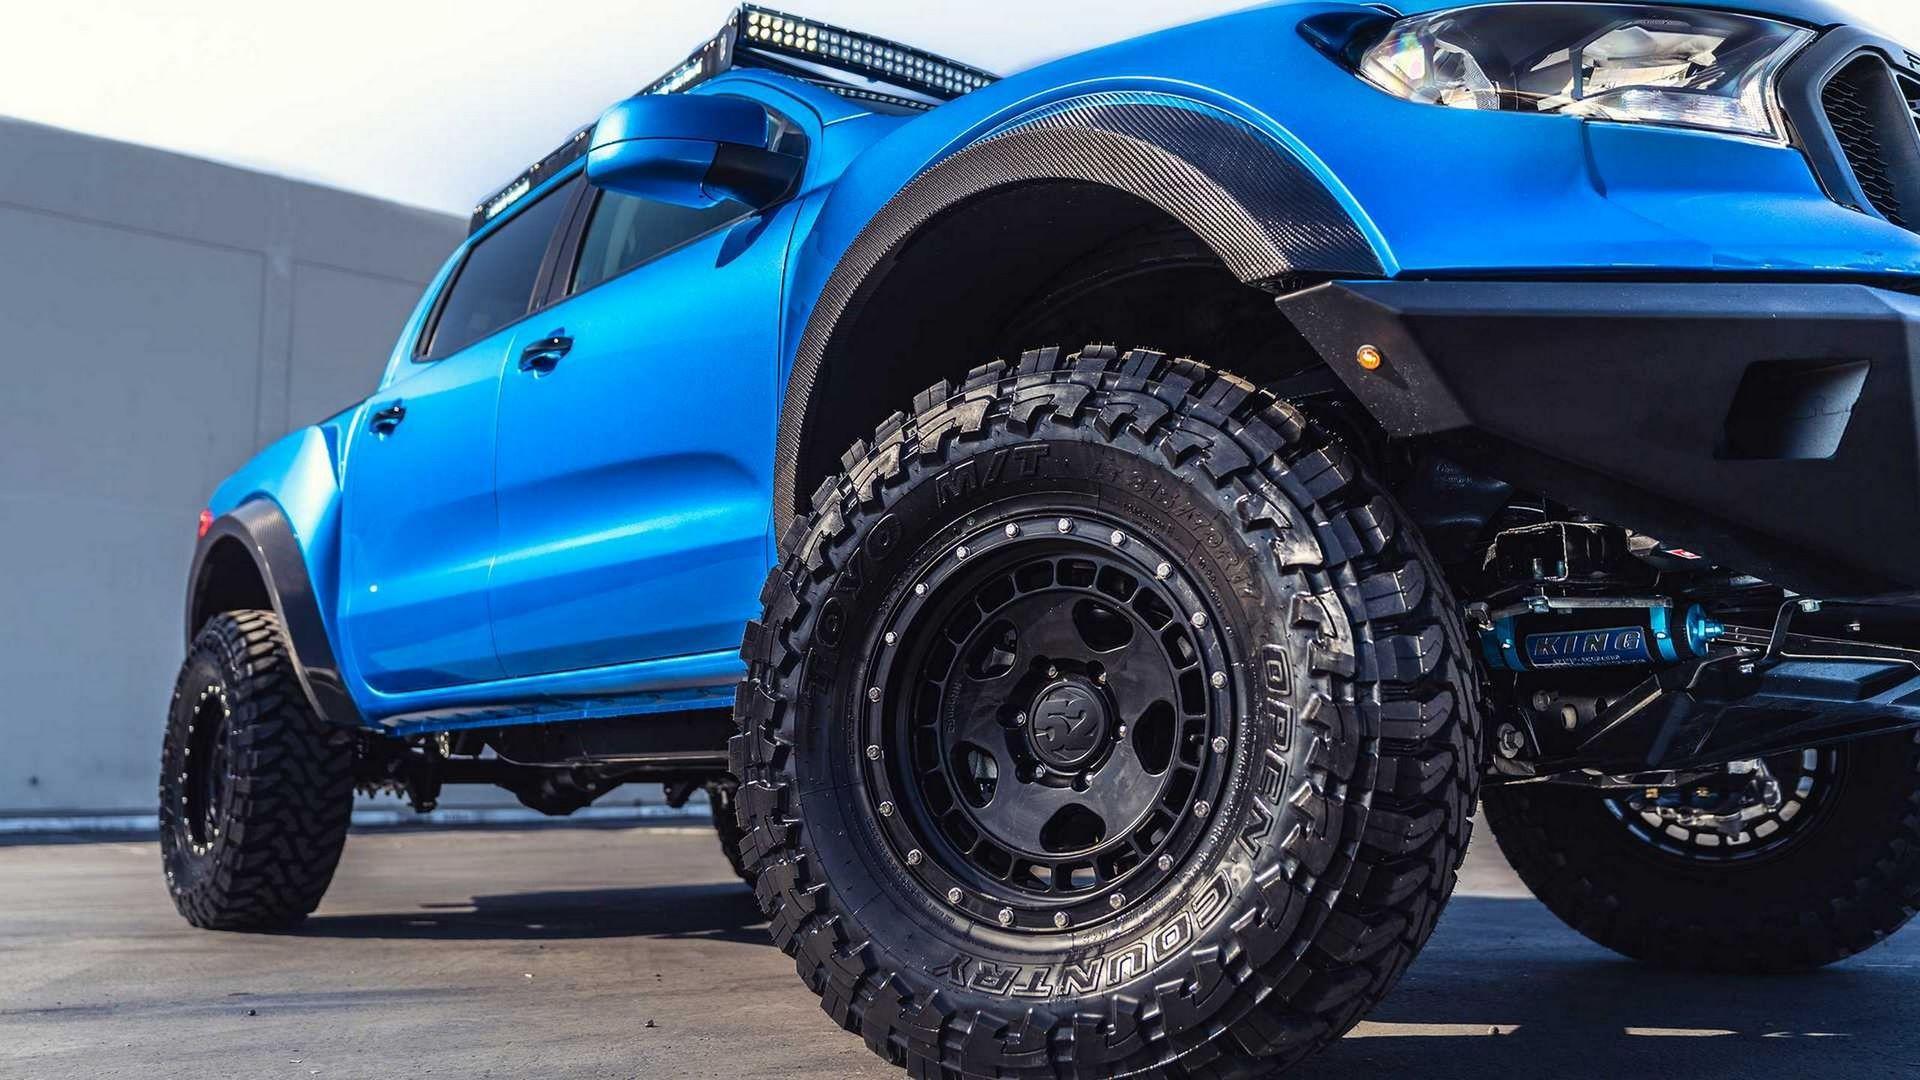 Ford-Ranger-Prorunner-By-APG-27